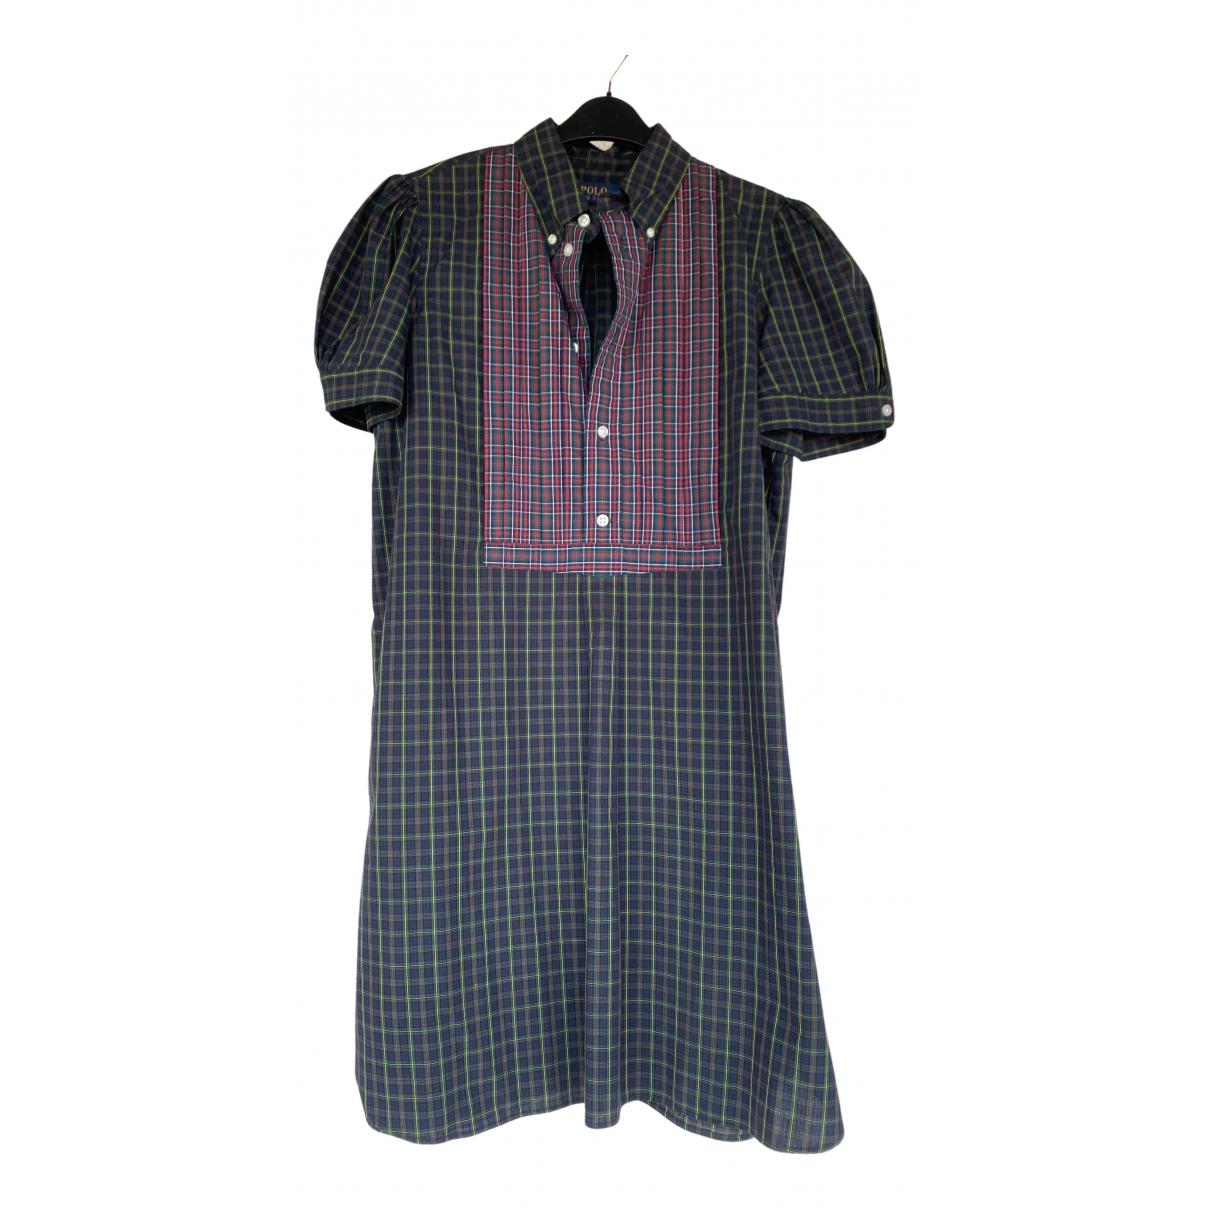 Polo Ralph Lauren \N Kleid in  Gruen Baumwolle